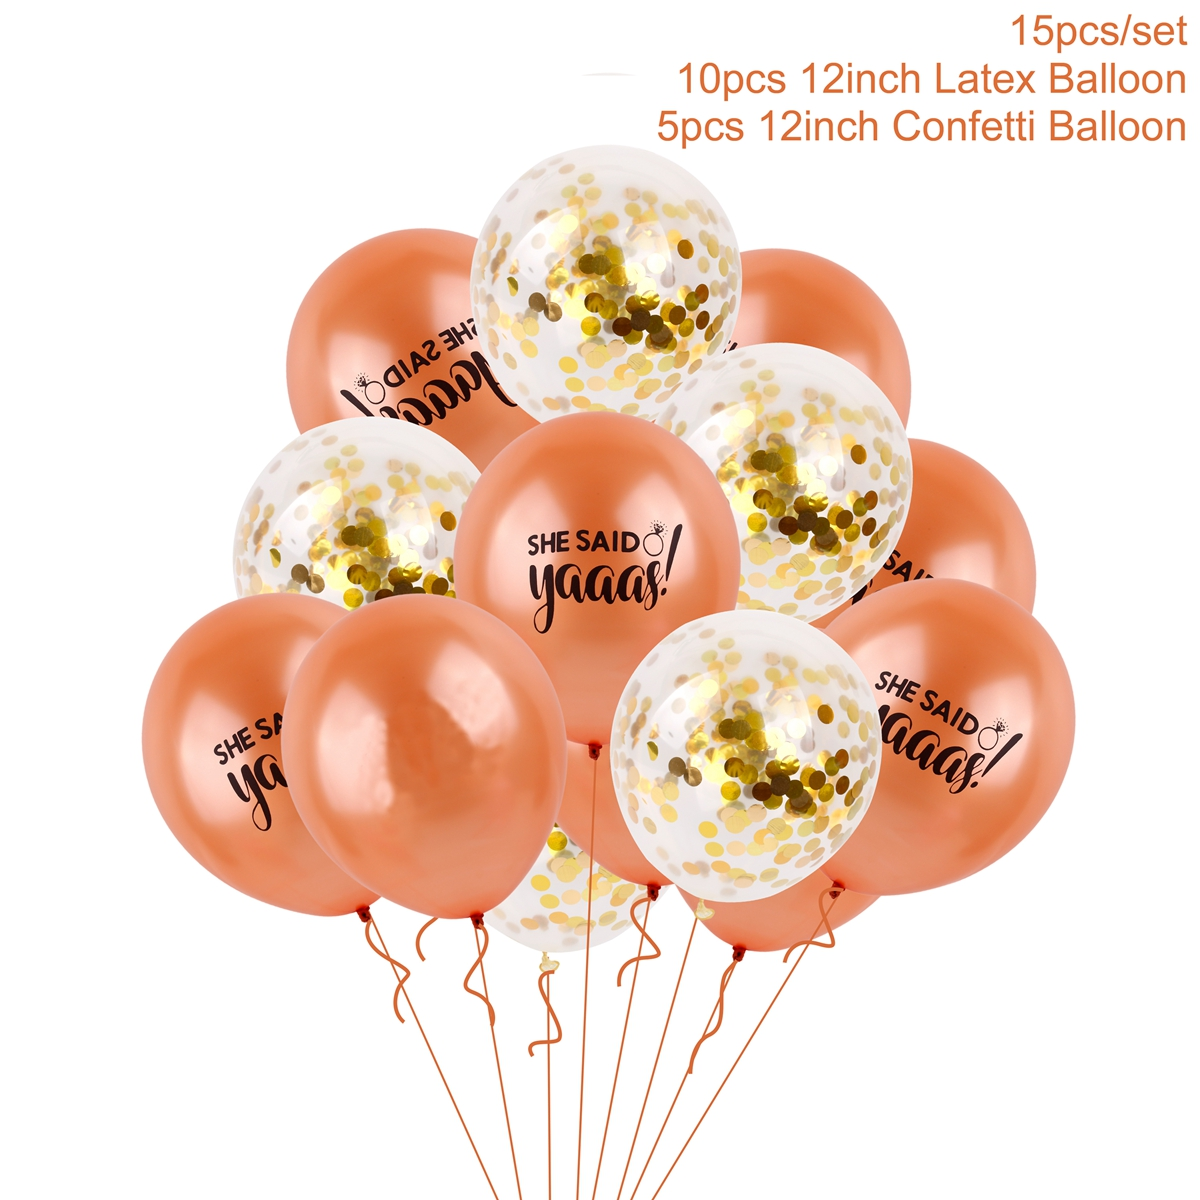 Engagement Valentine 15pc Love Balloons Foil /& Confetti Party Decor Wedding